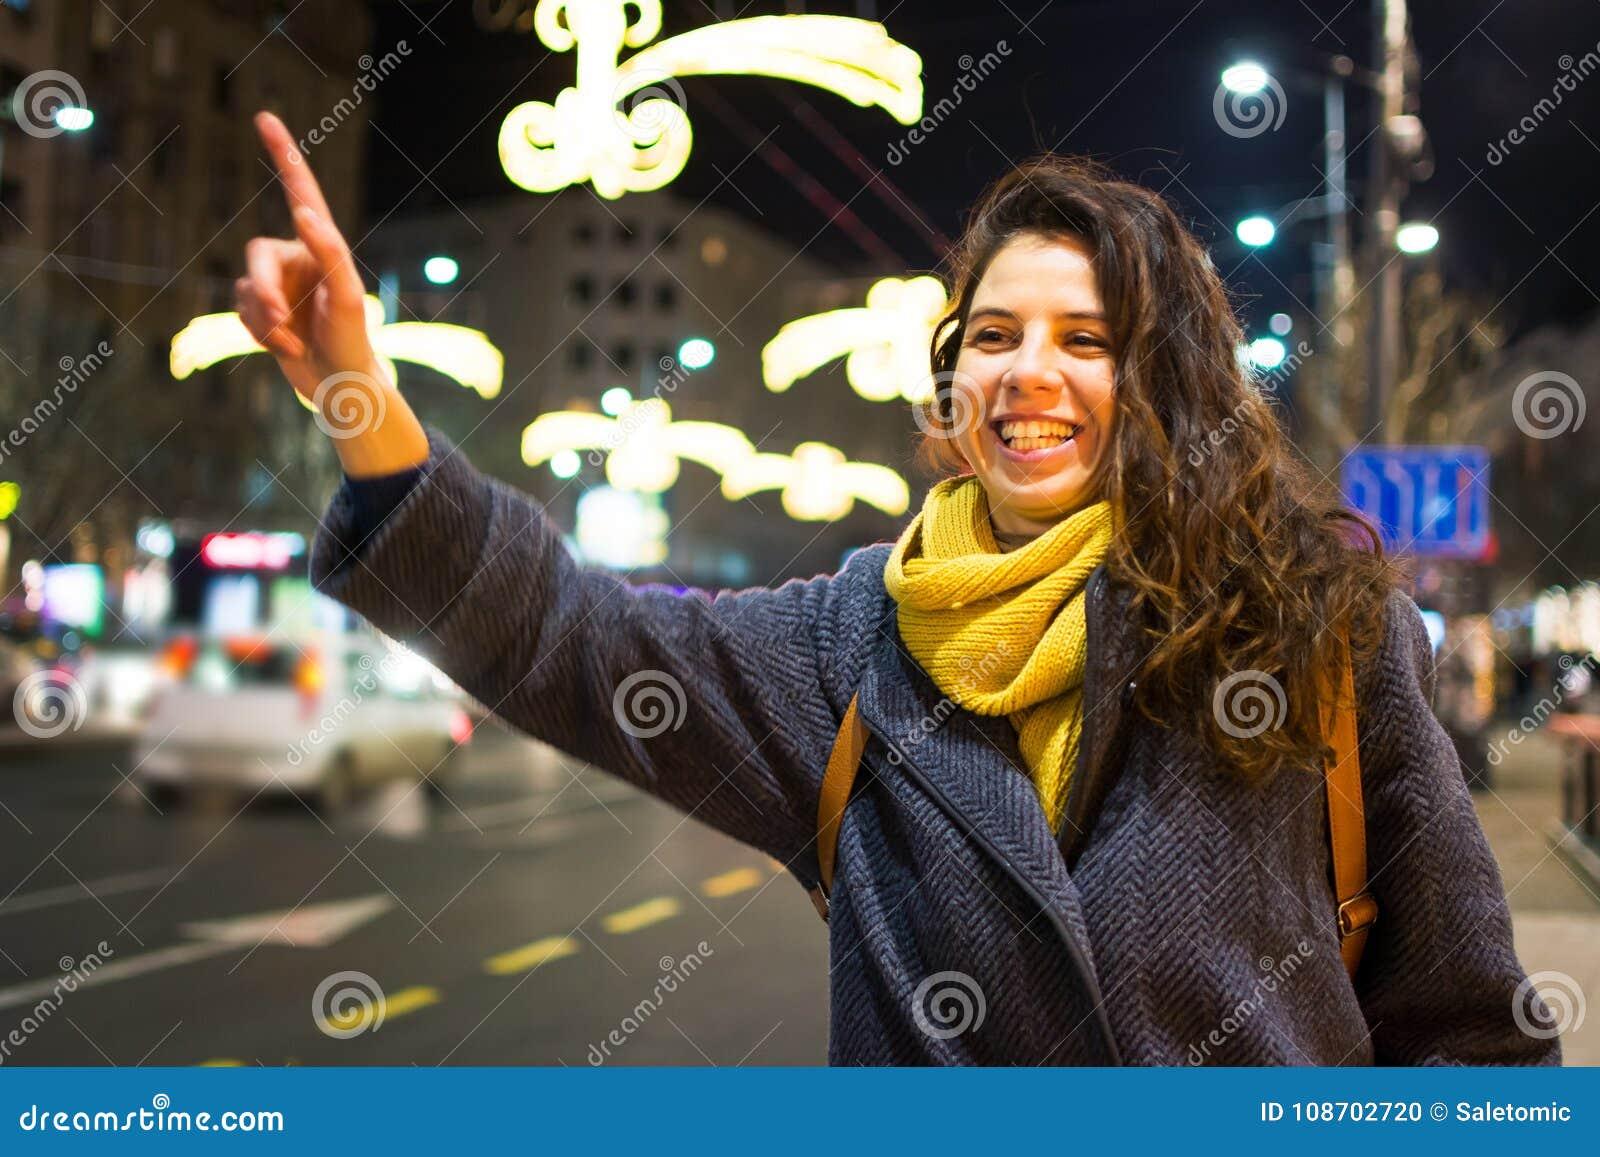 Girl calling taxi in urban environment